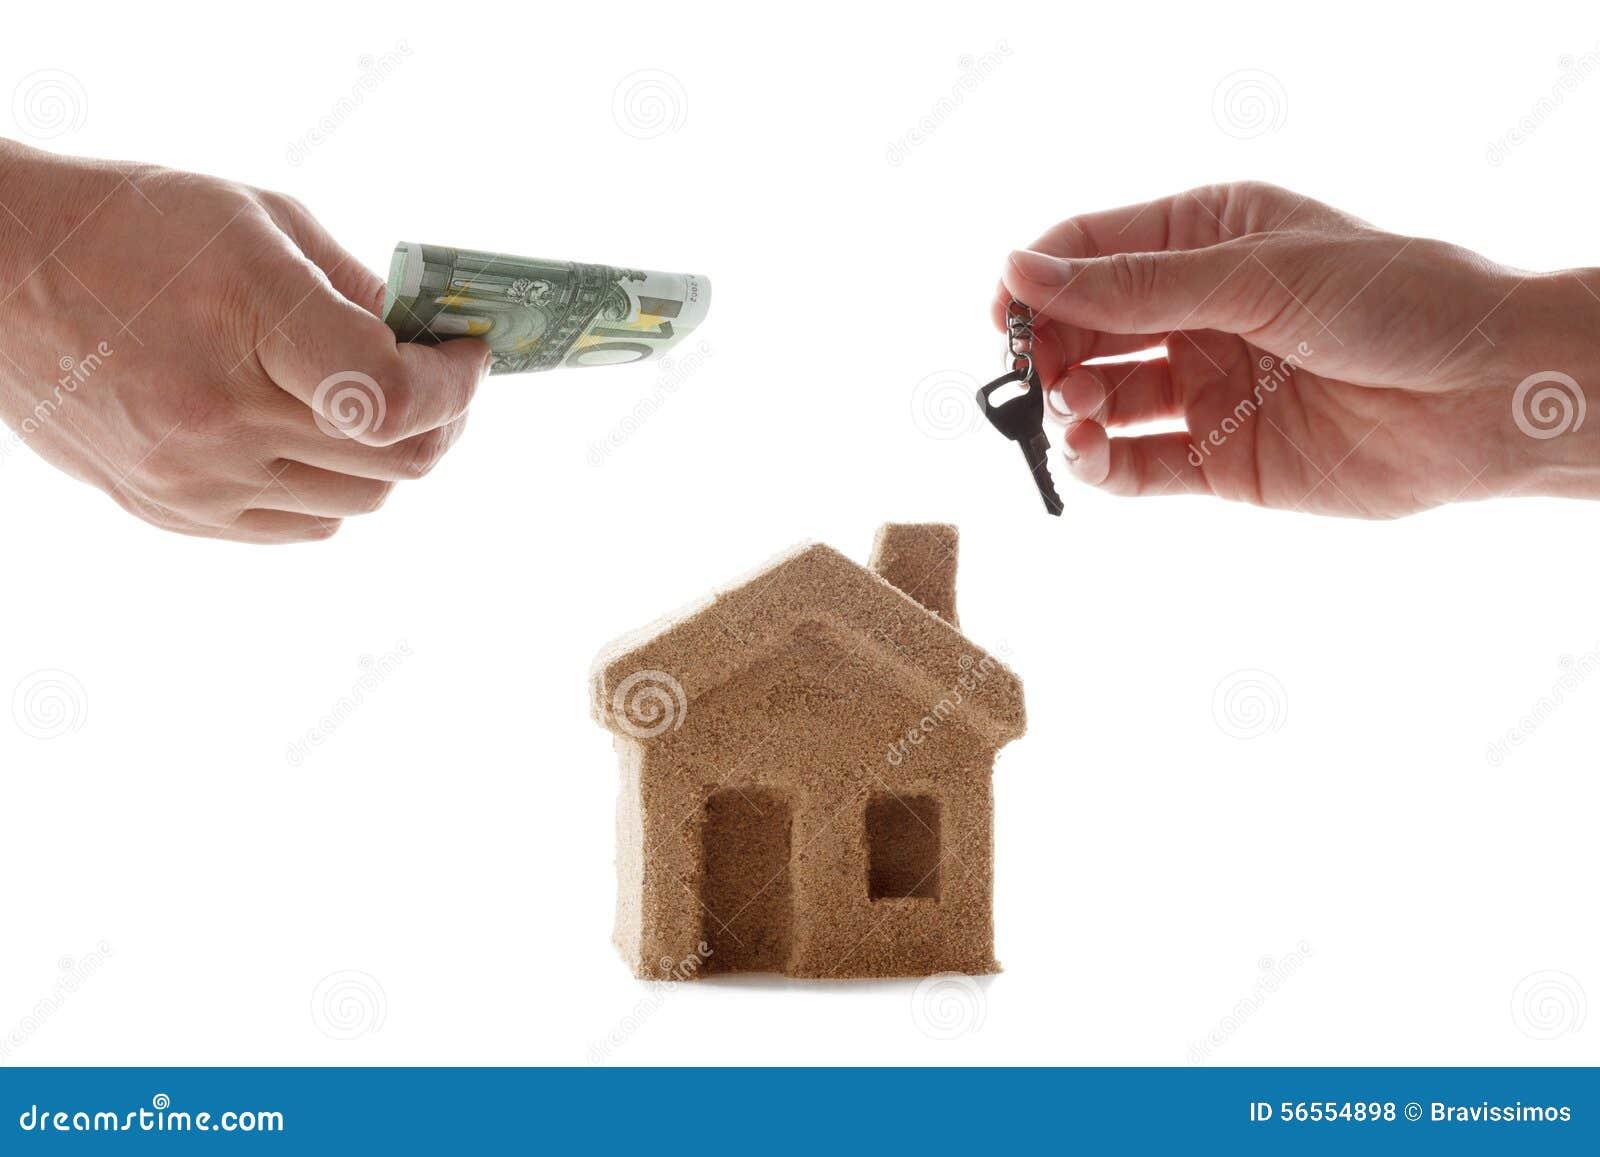 Download Εικονίδιο του μισθώματος και της πώλησης σπιτιών Στοκ Εικόνες - εικόνα από αντικείμενα, ανασκόπησης: 56554898